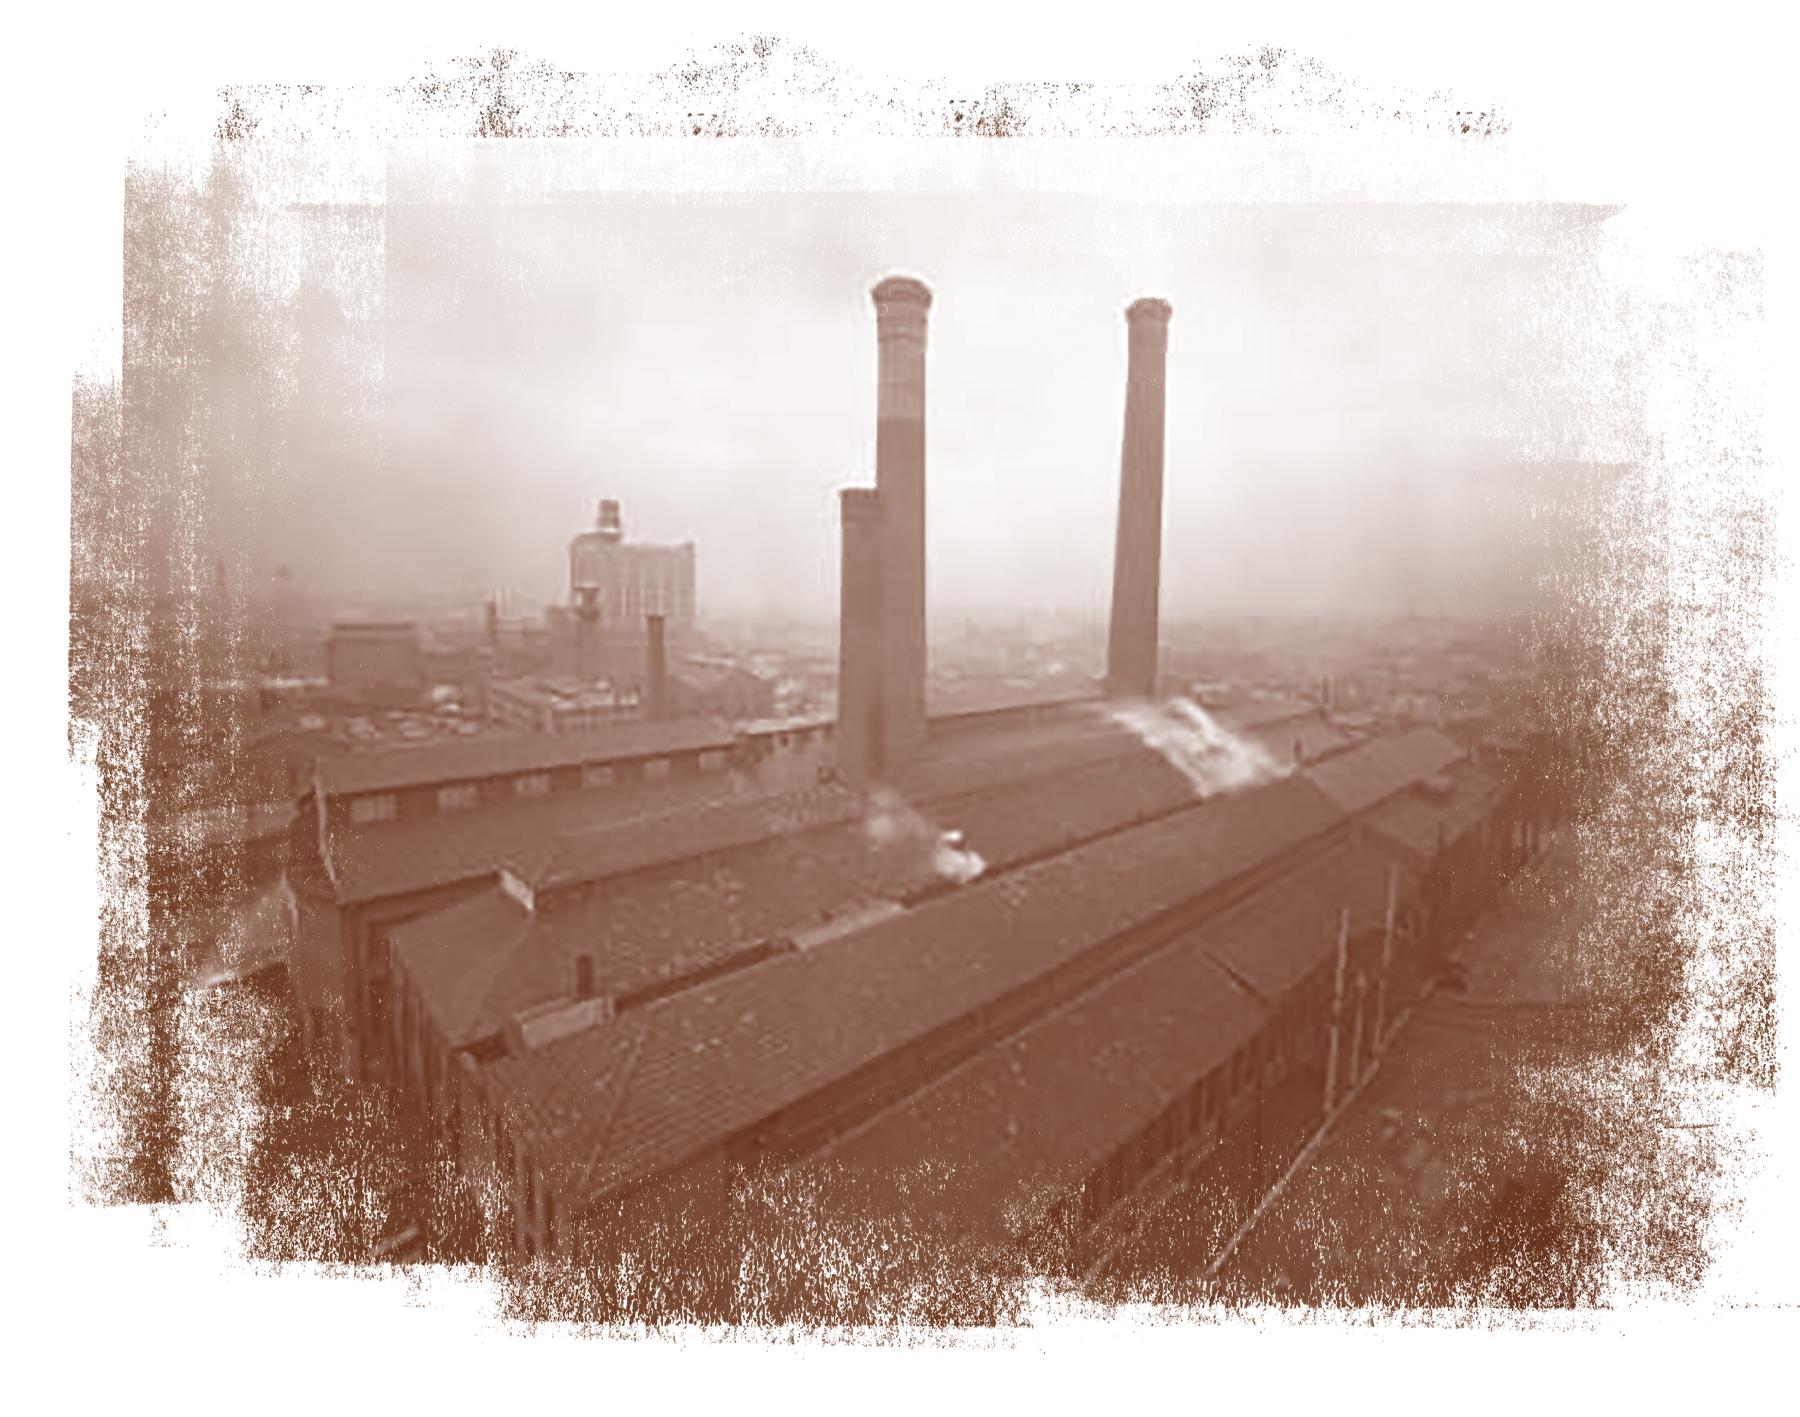 Brick foundries in the Smoketown neighborhood of Louisville in the 1930s